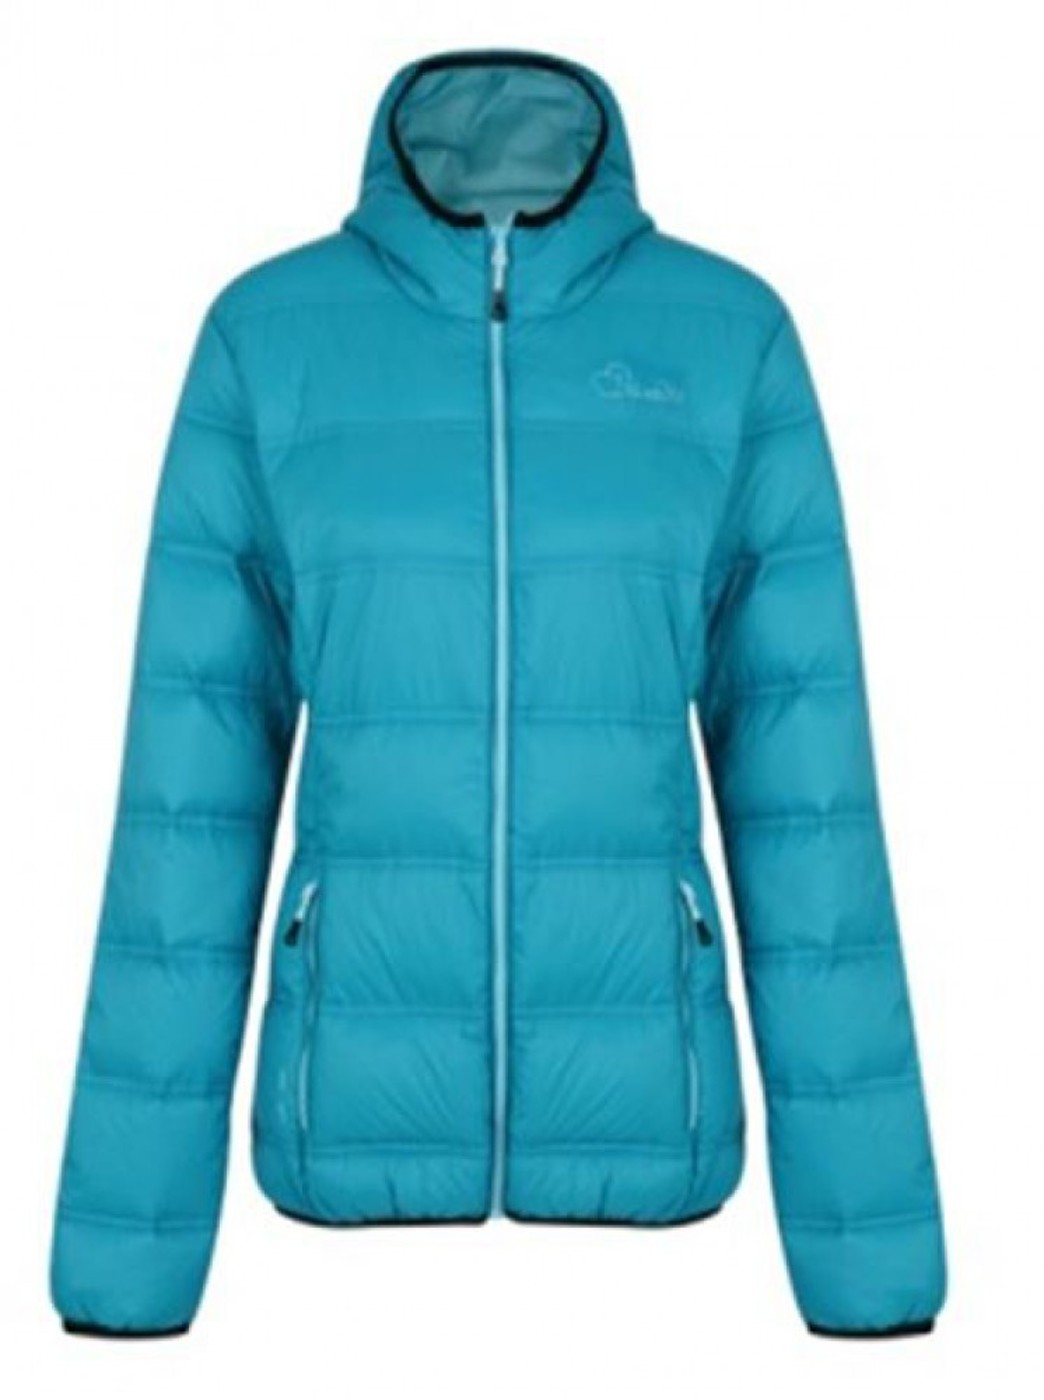 DARE2B Low Down Jacket   BlWng/LumPnk 20 - Damen